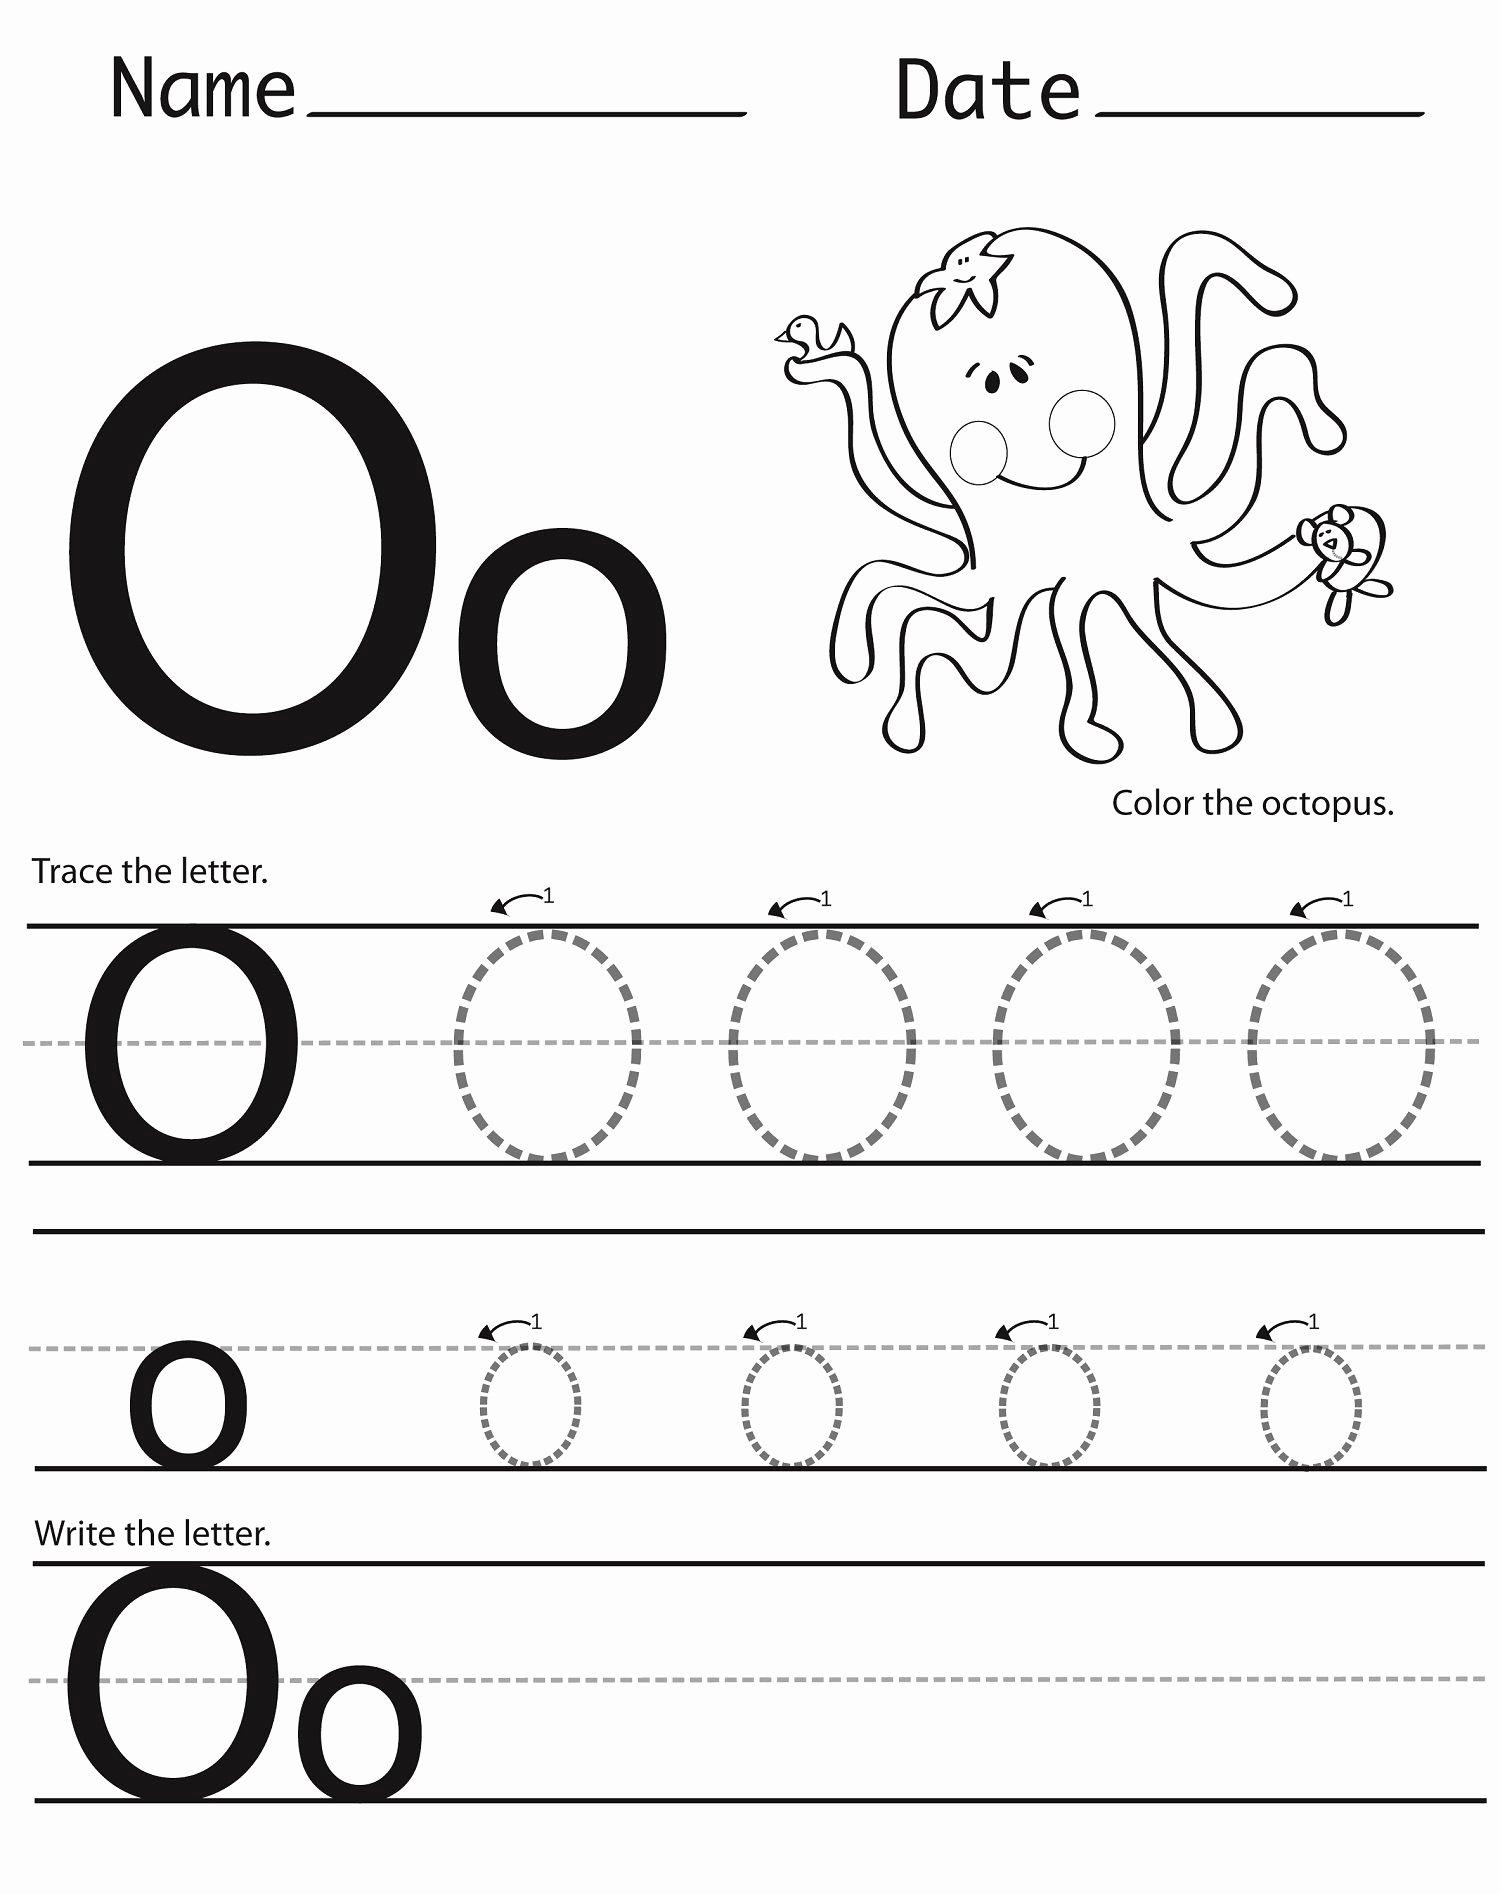 Letter O Worksheets for Preschool Printable Letter O Worksheets for Preschool